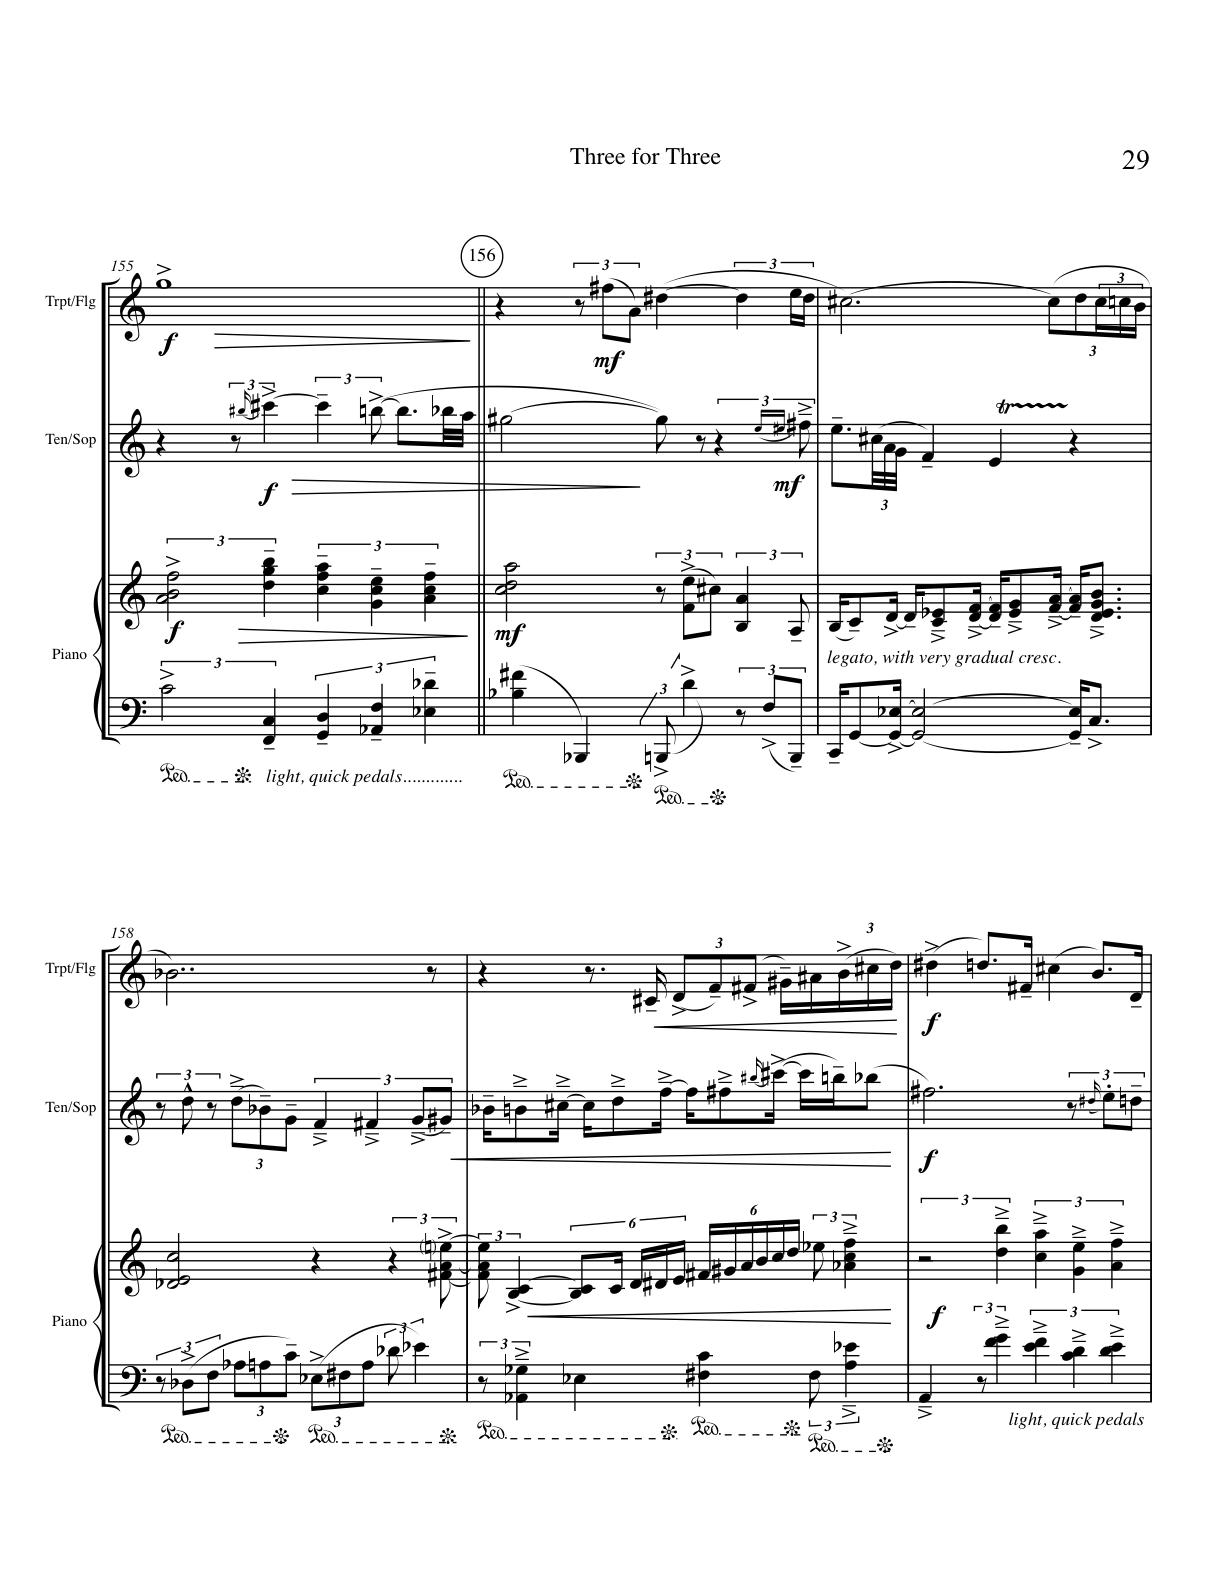 Hooked On A Feeling Piano Sheet Music Free